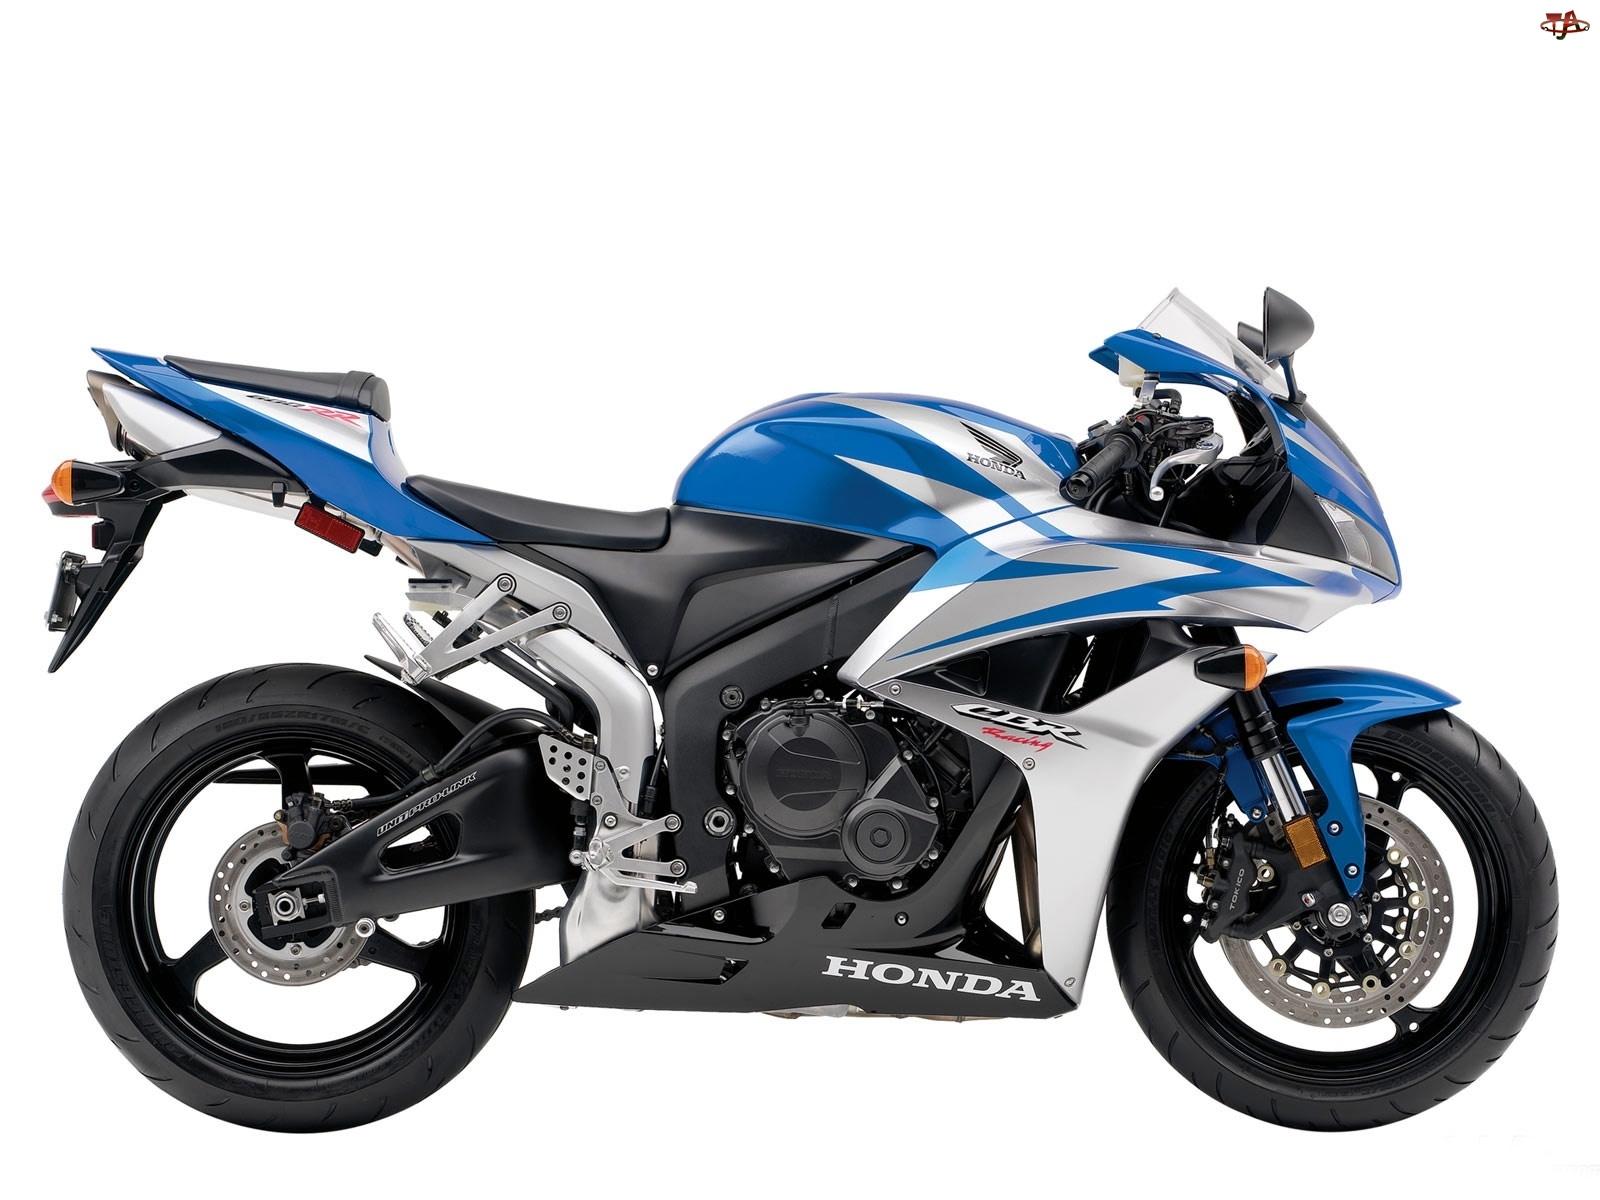 Rama, Honda CBR600RR, Czarna